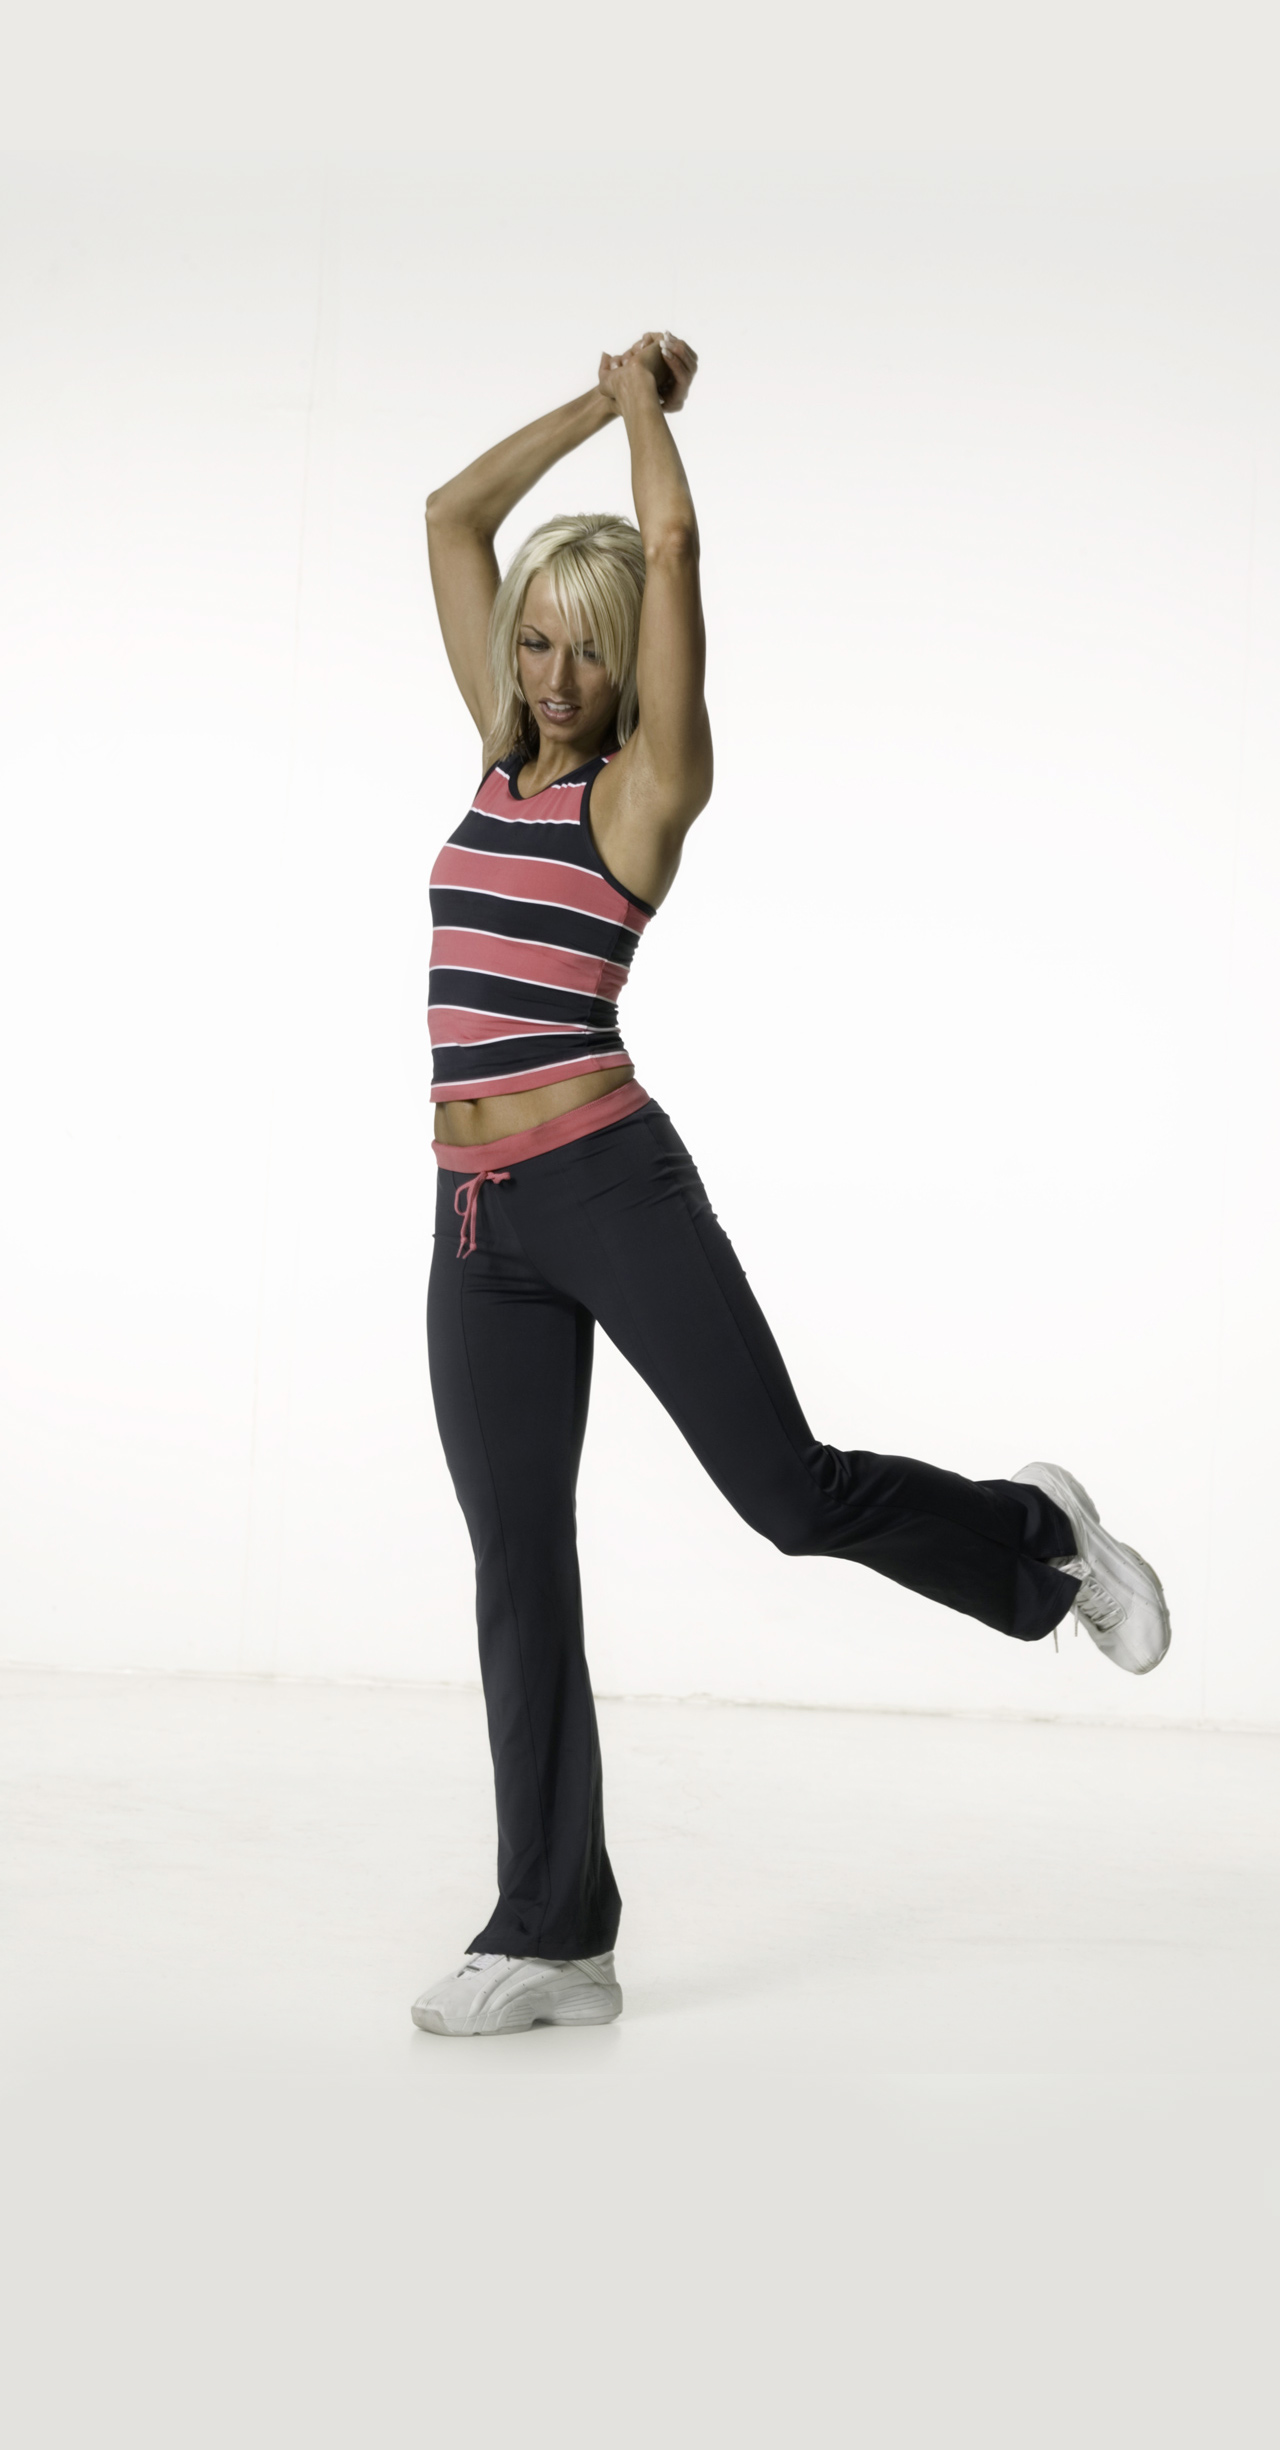 Aerobics Woman